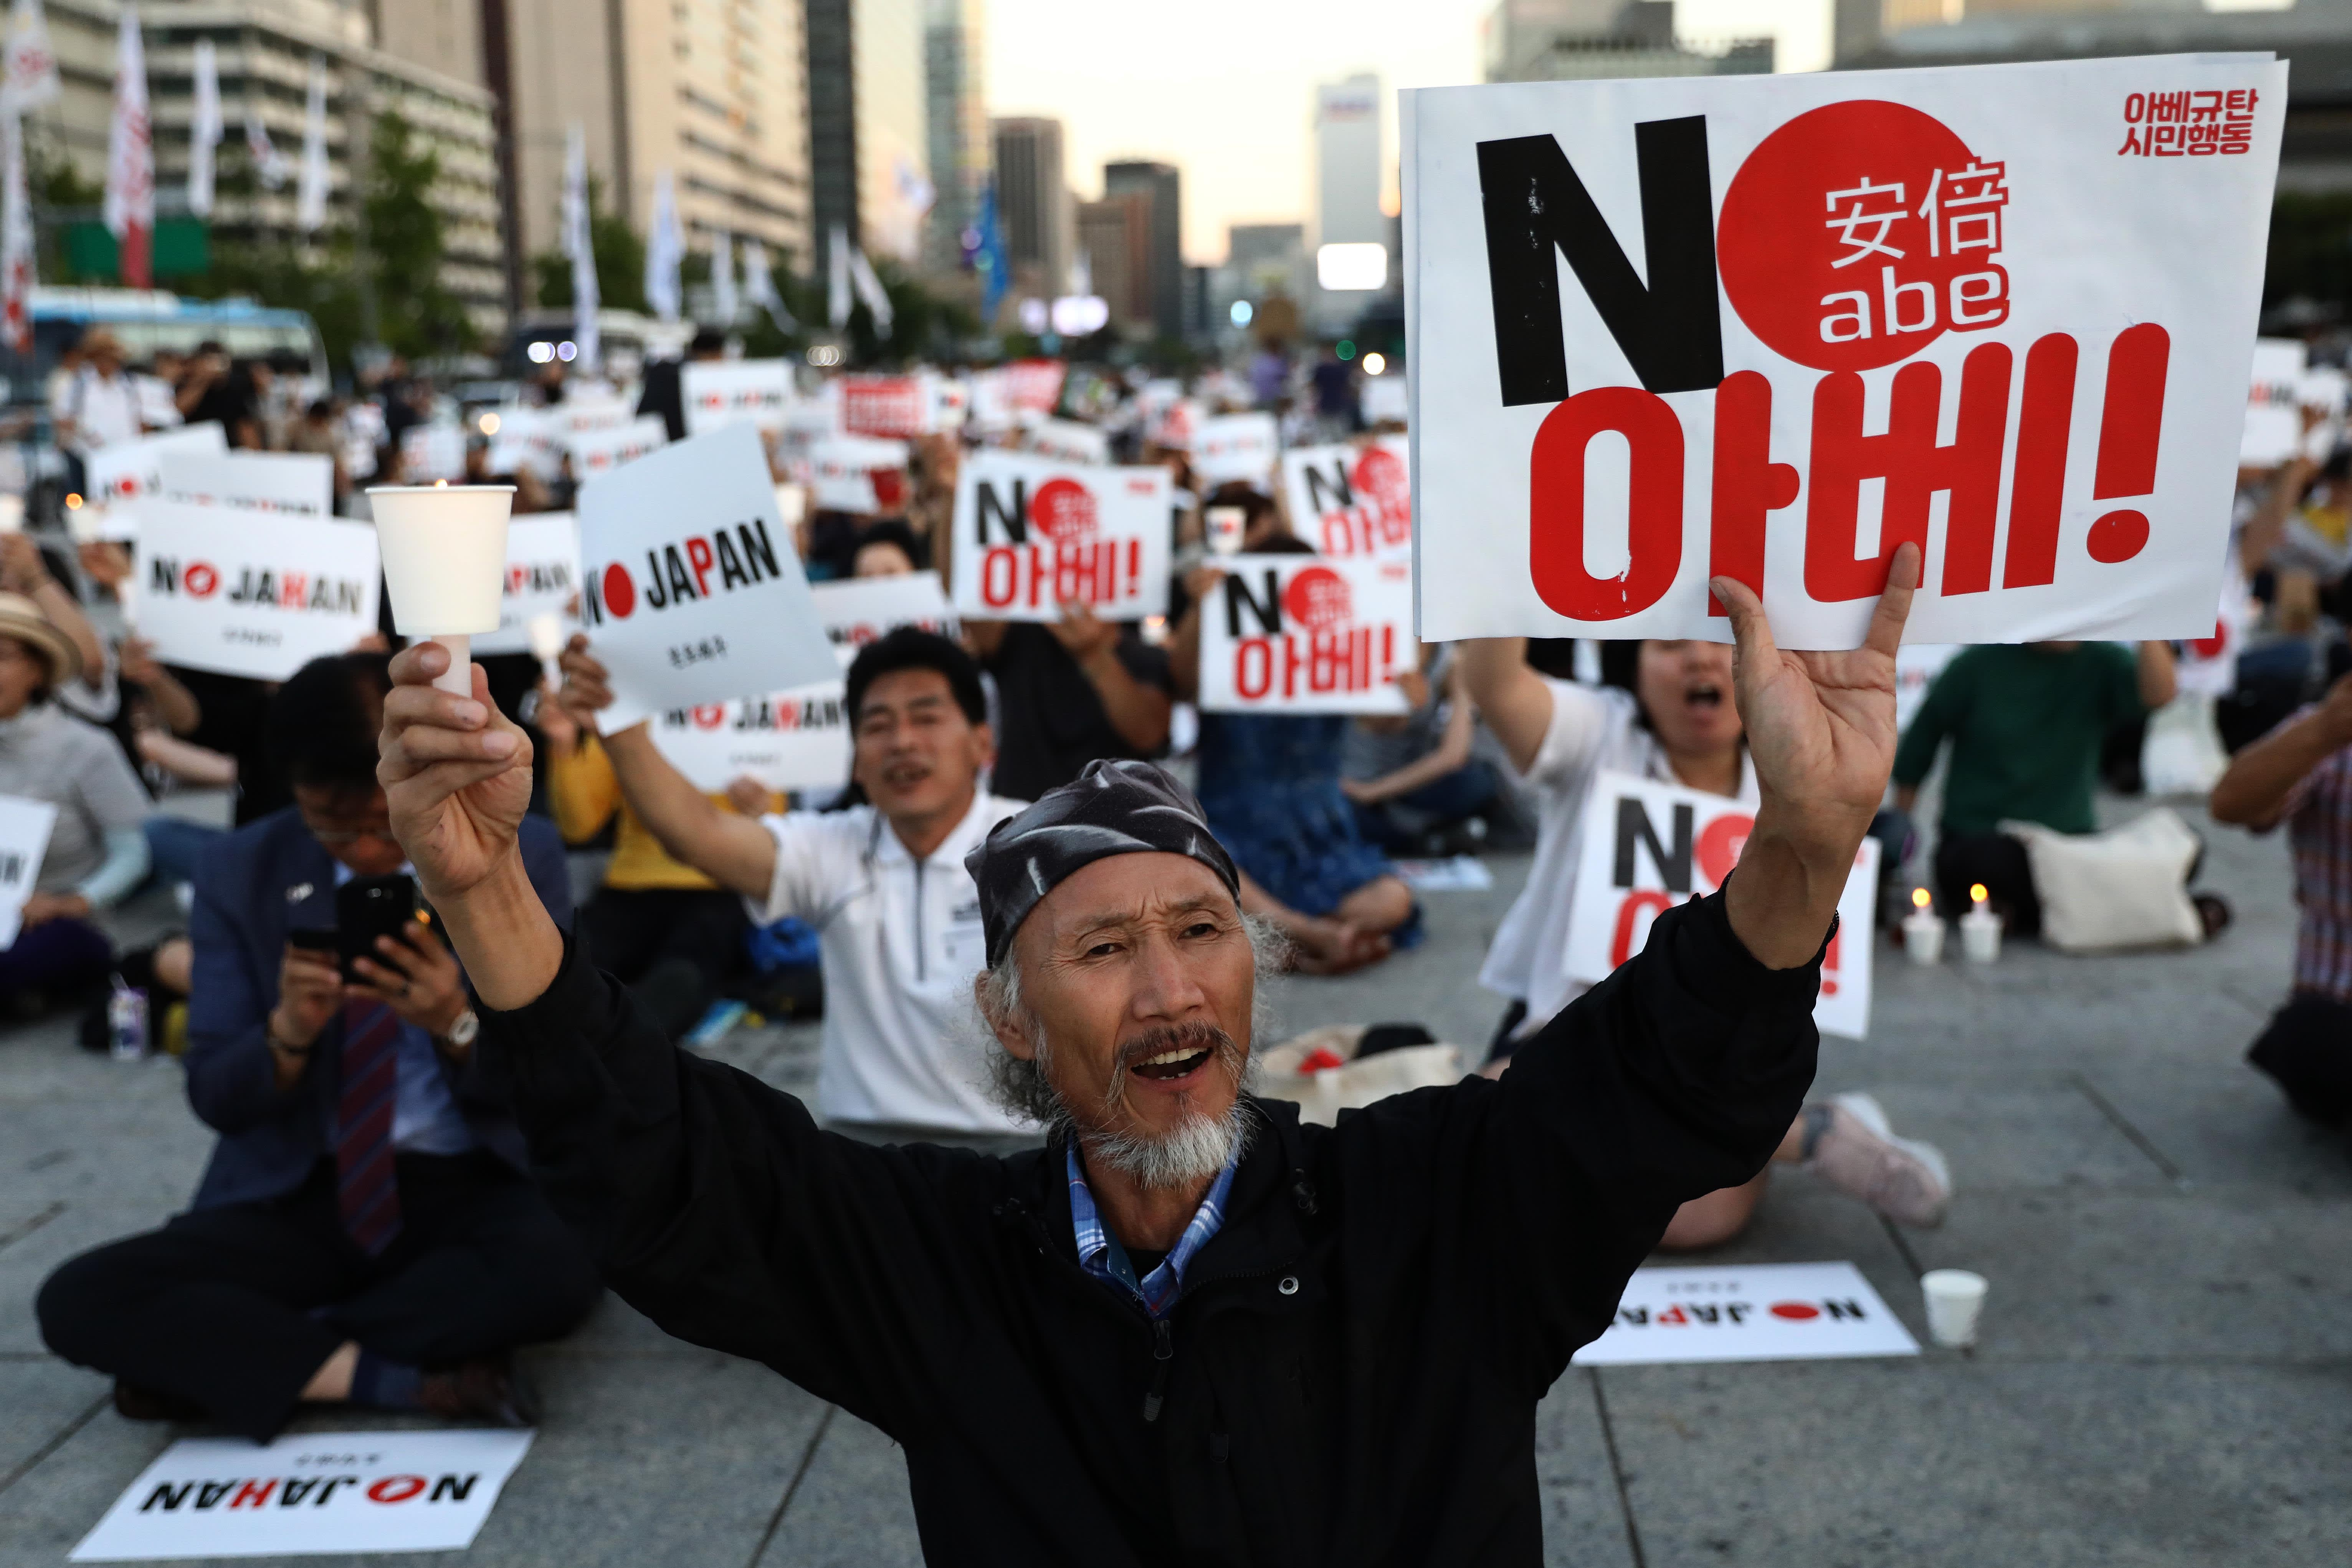 South Korea and Japan seek to resolve trade dispute, amid dim economic outlook